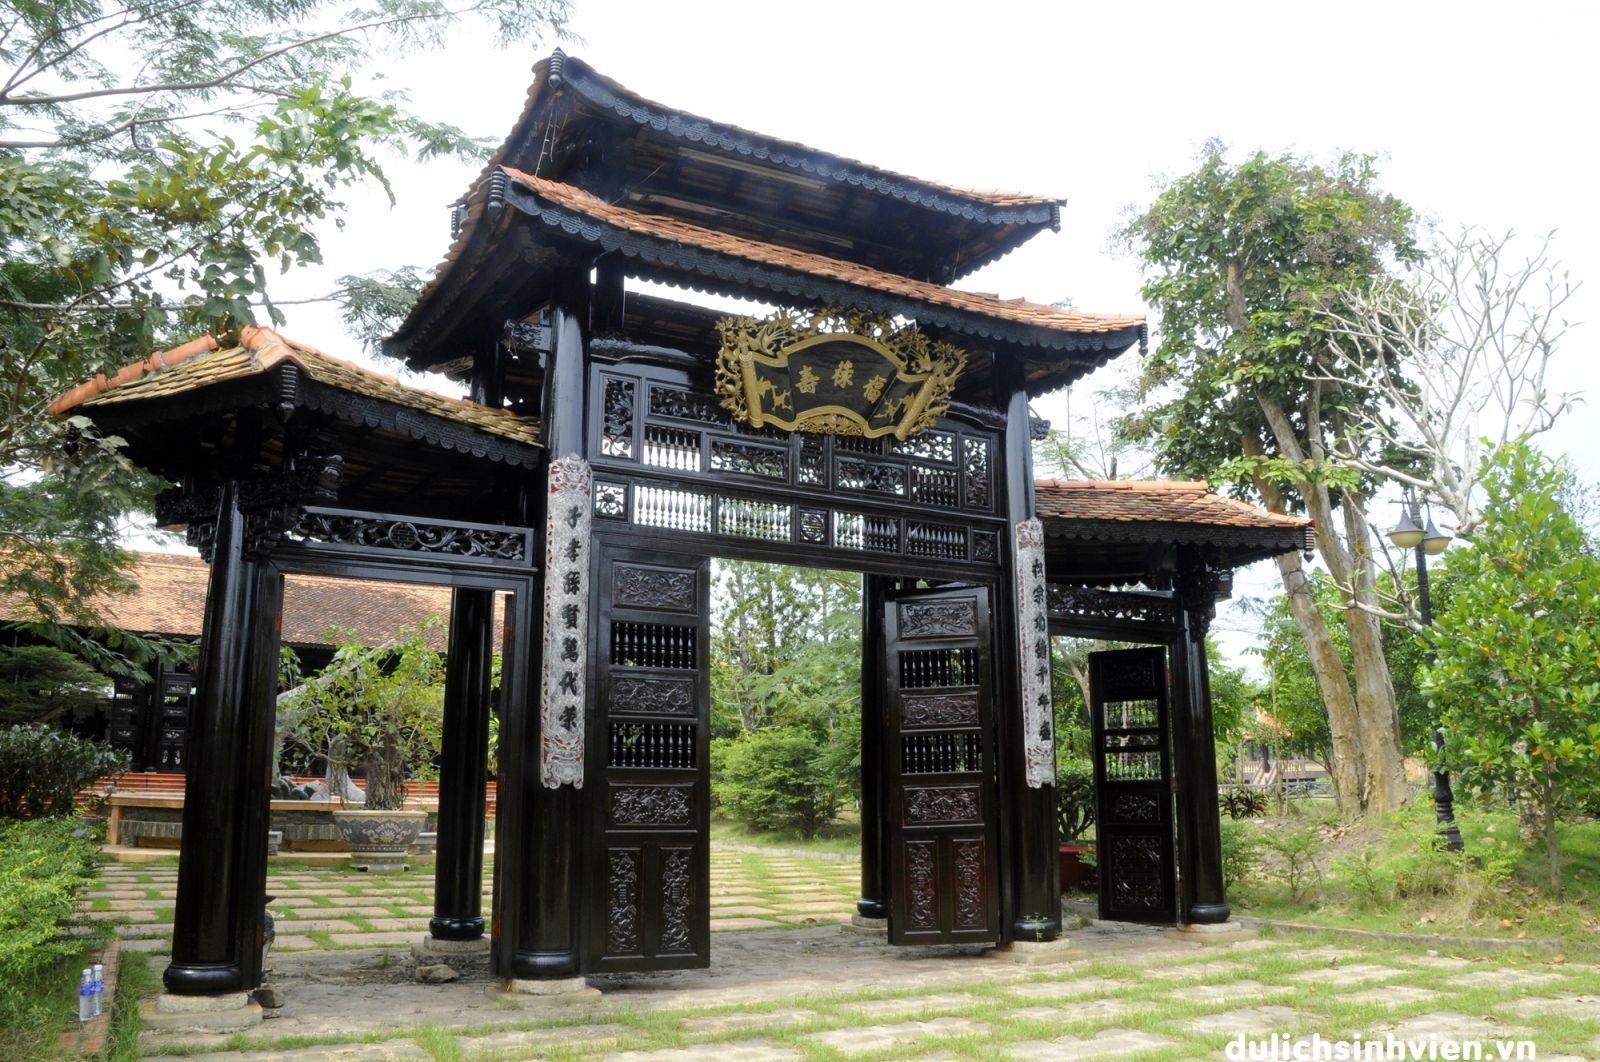 Dong Ngac Cultural Village